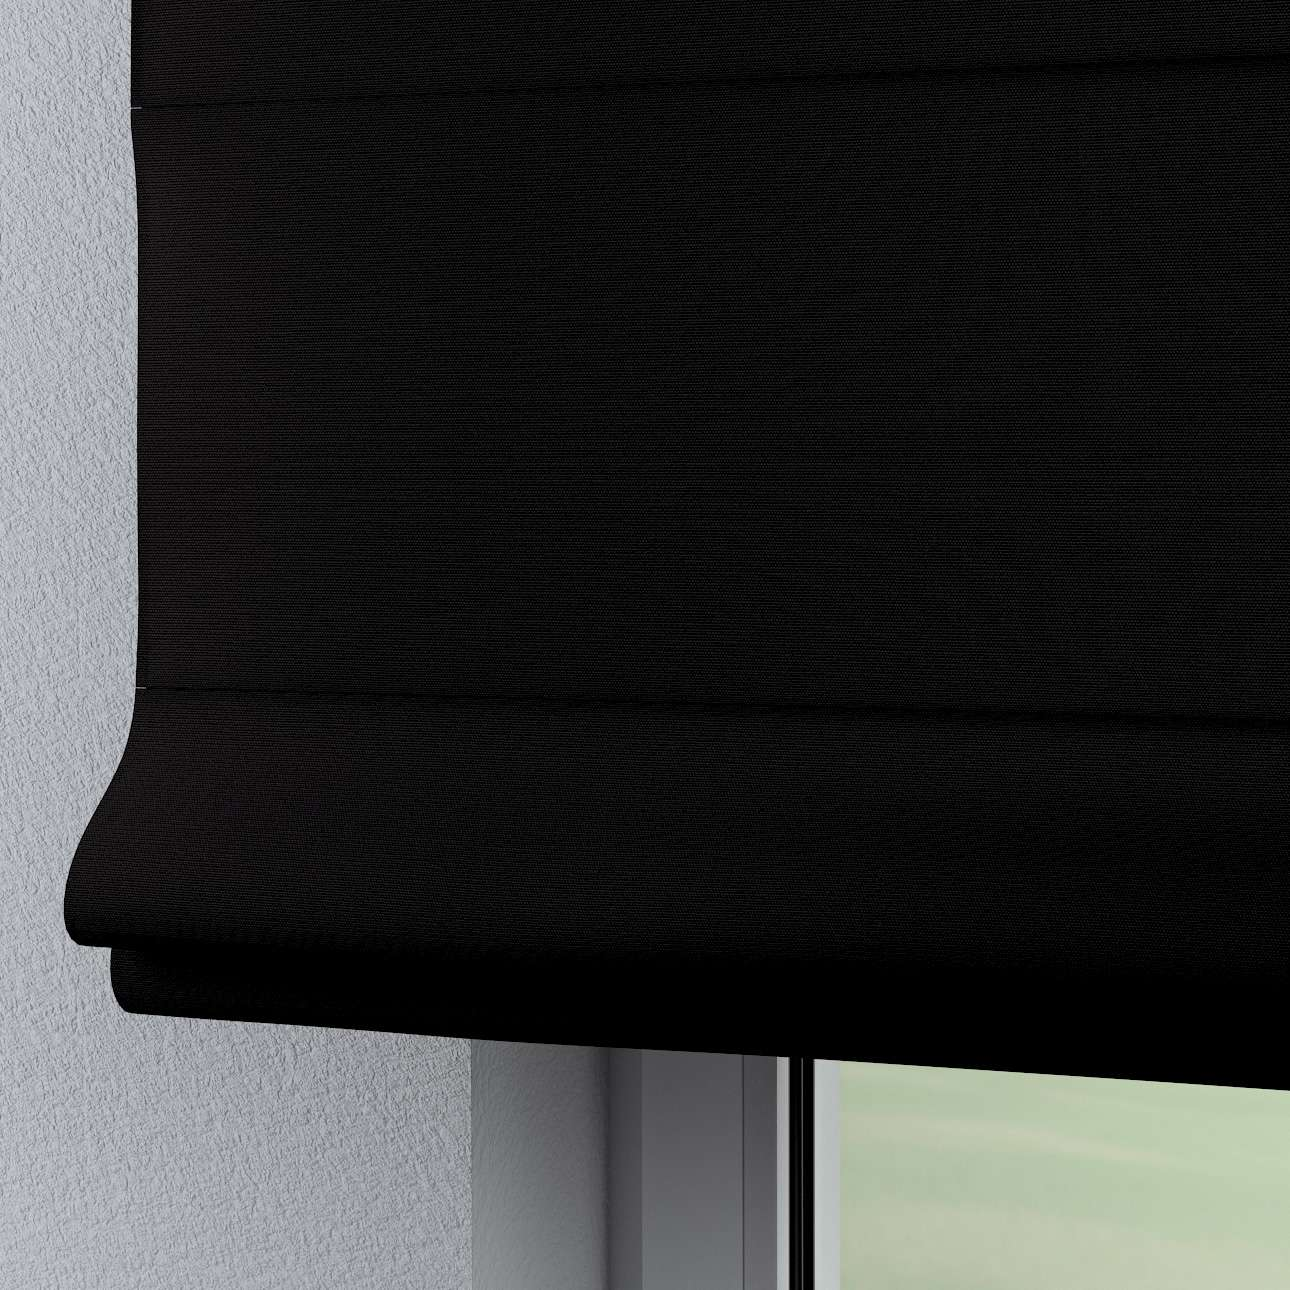 Hissgardin Verona 80 x 170 cm i kollektionen Panama Cotton , Tyg: 702-08